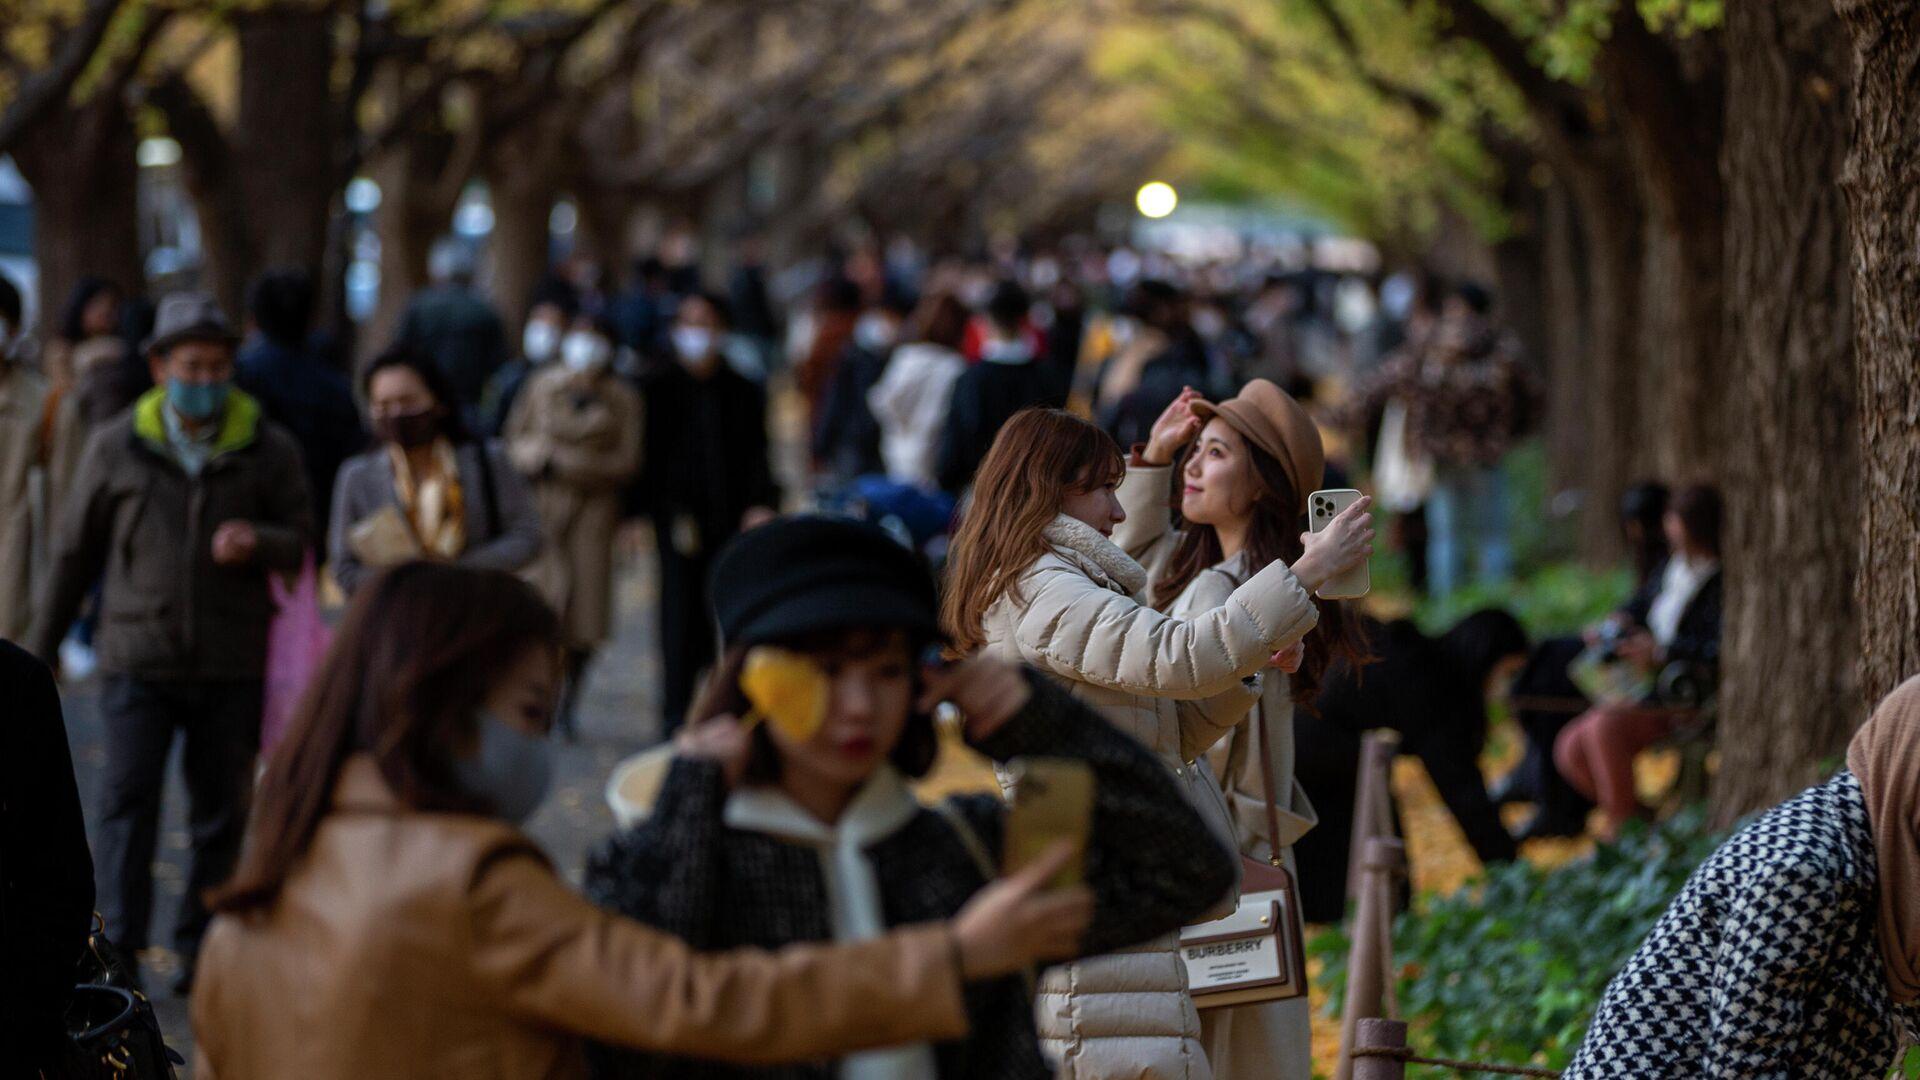 Люди на прогулке в Токио  - РИА Новости, 1920, 03.03.2021